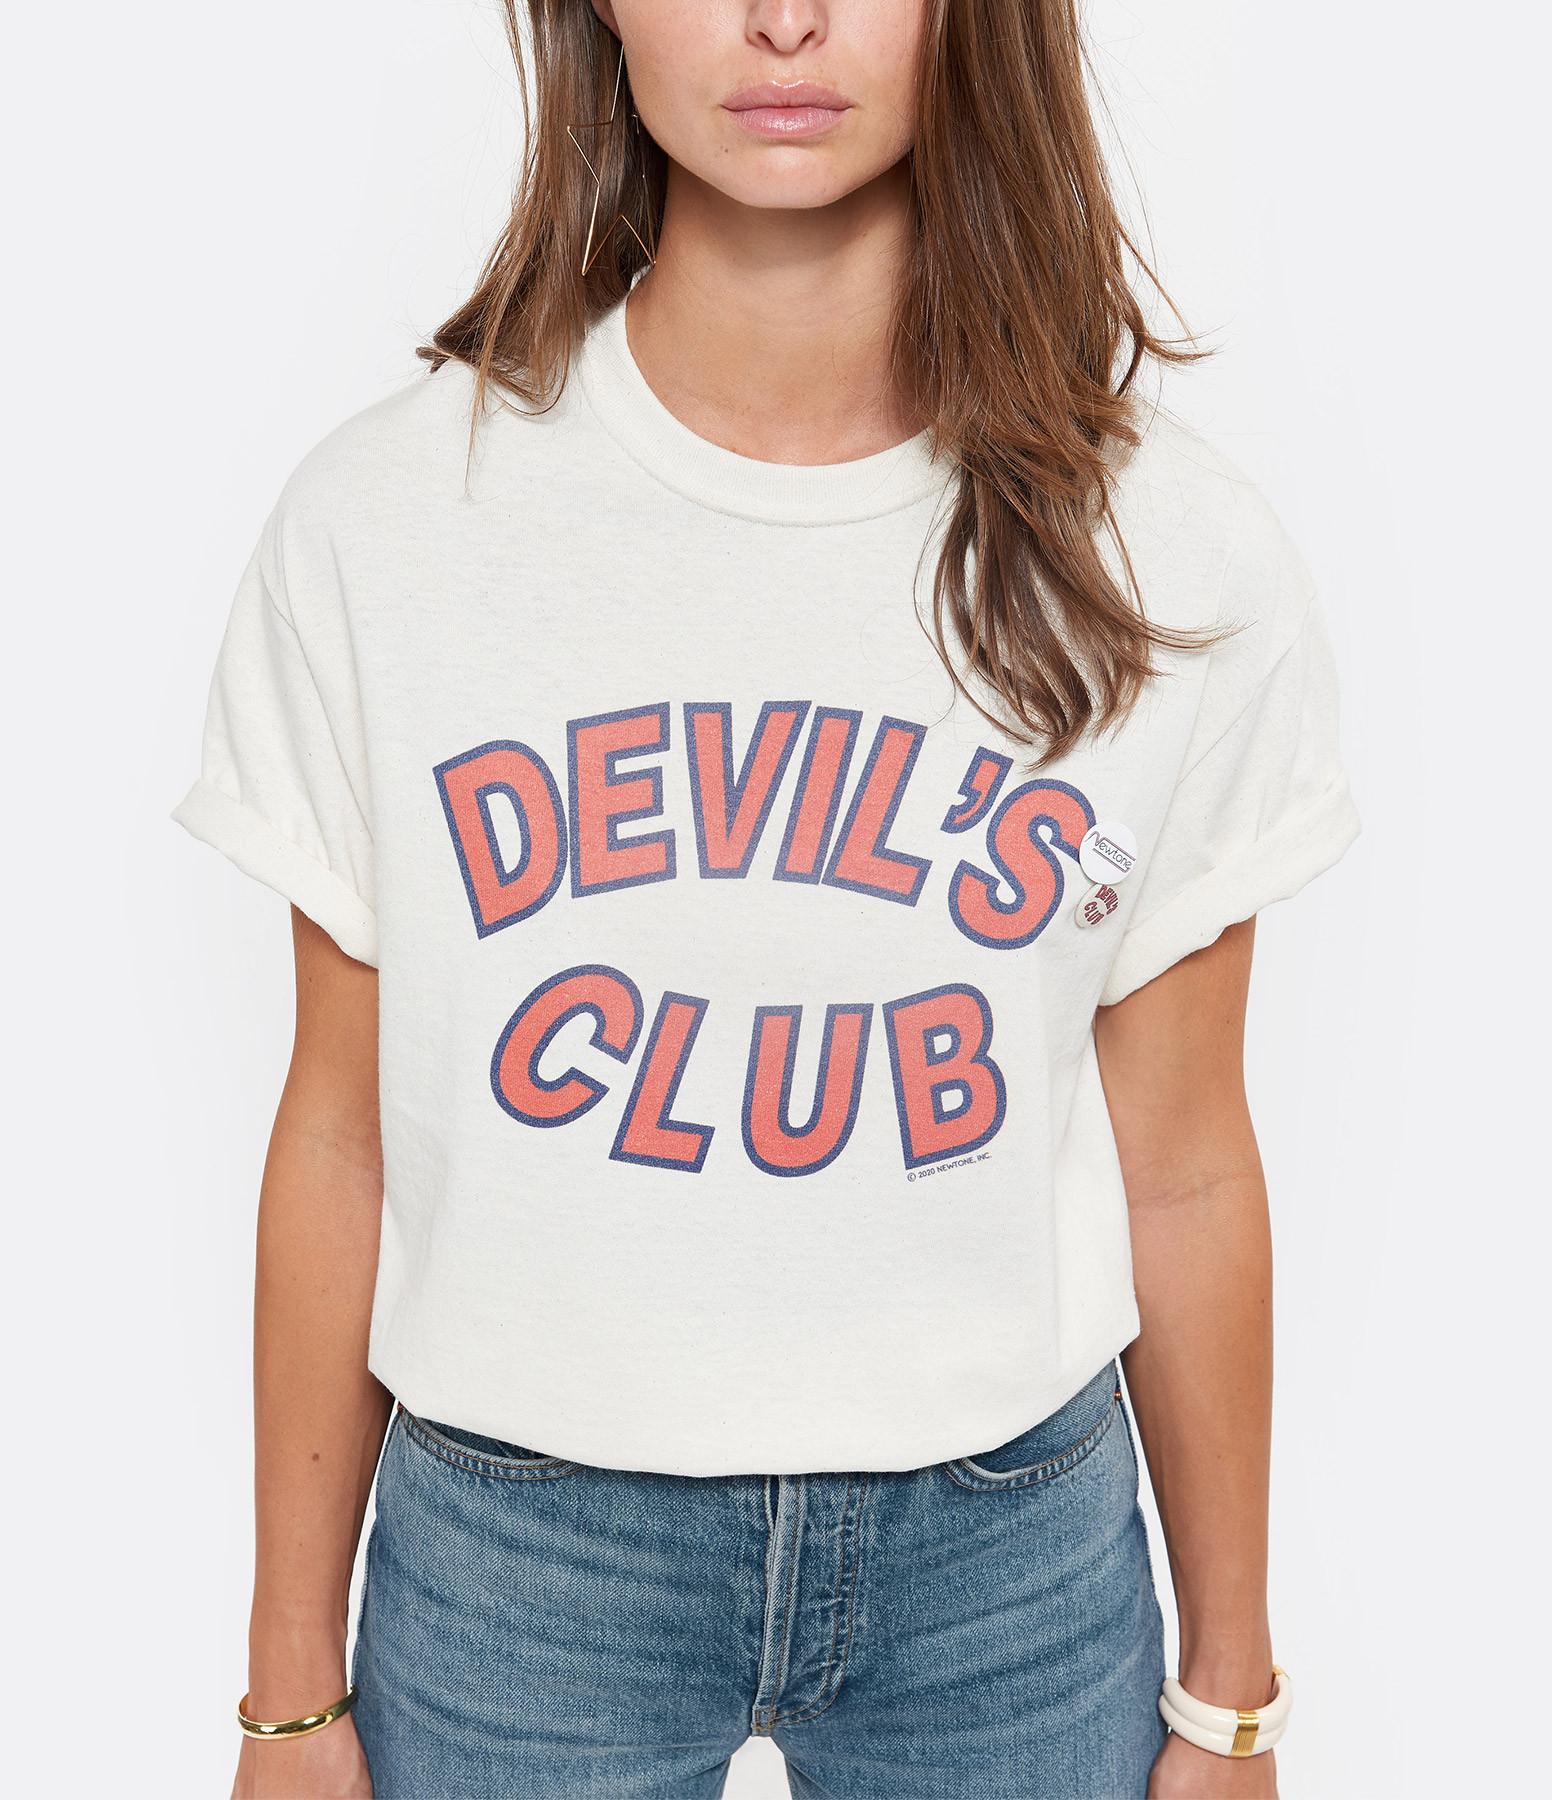 NEWTONE - Tee-shirt Devil Coton Naturel